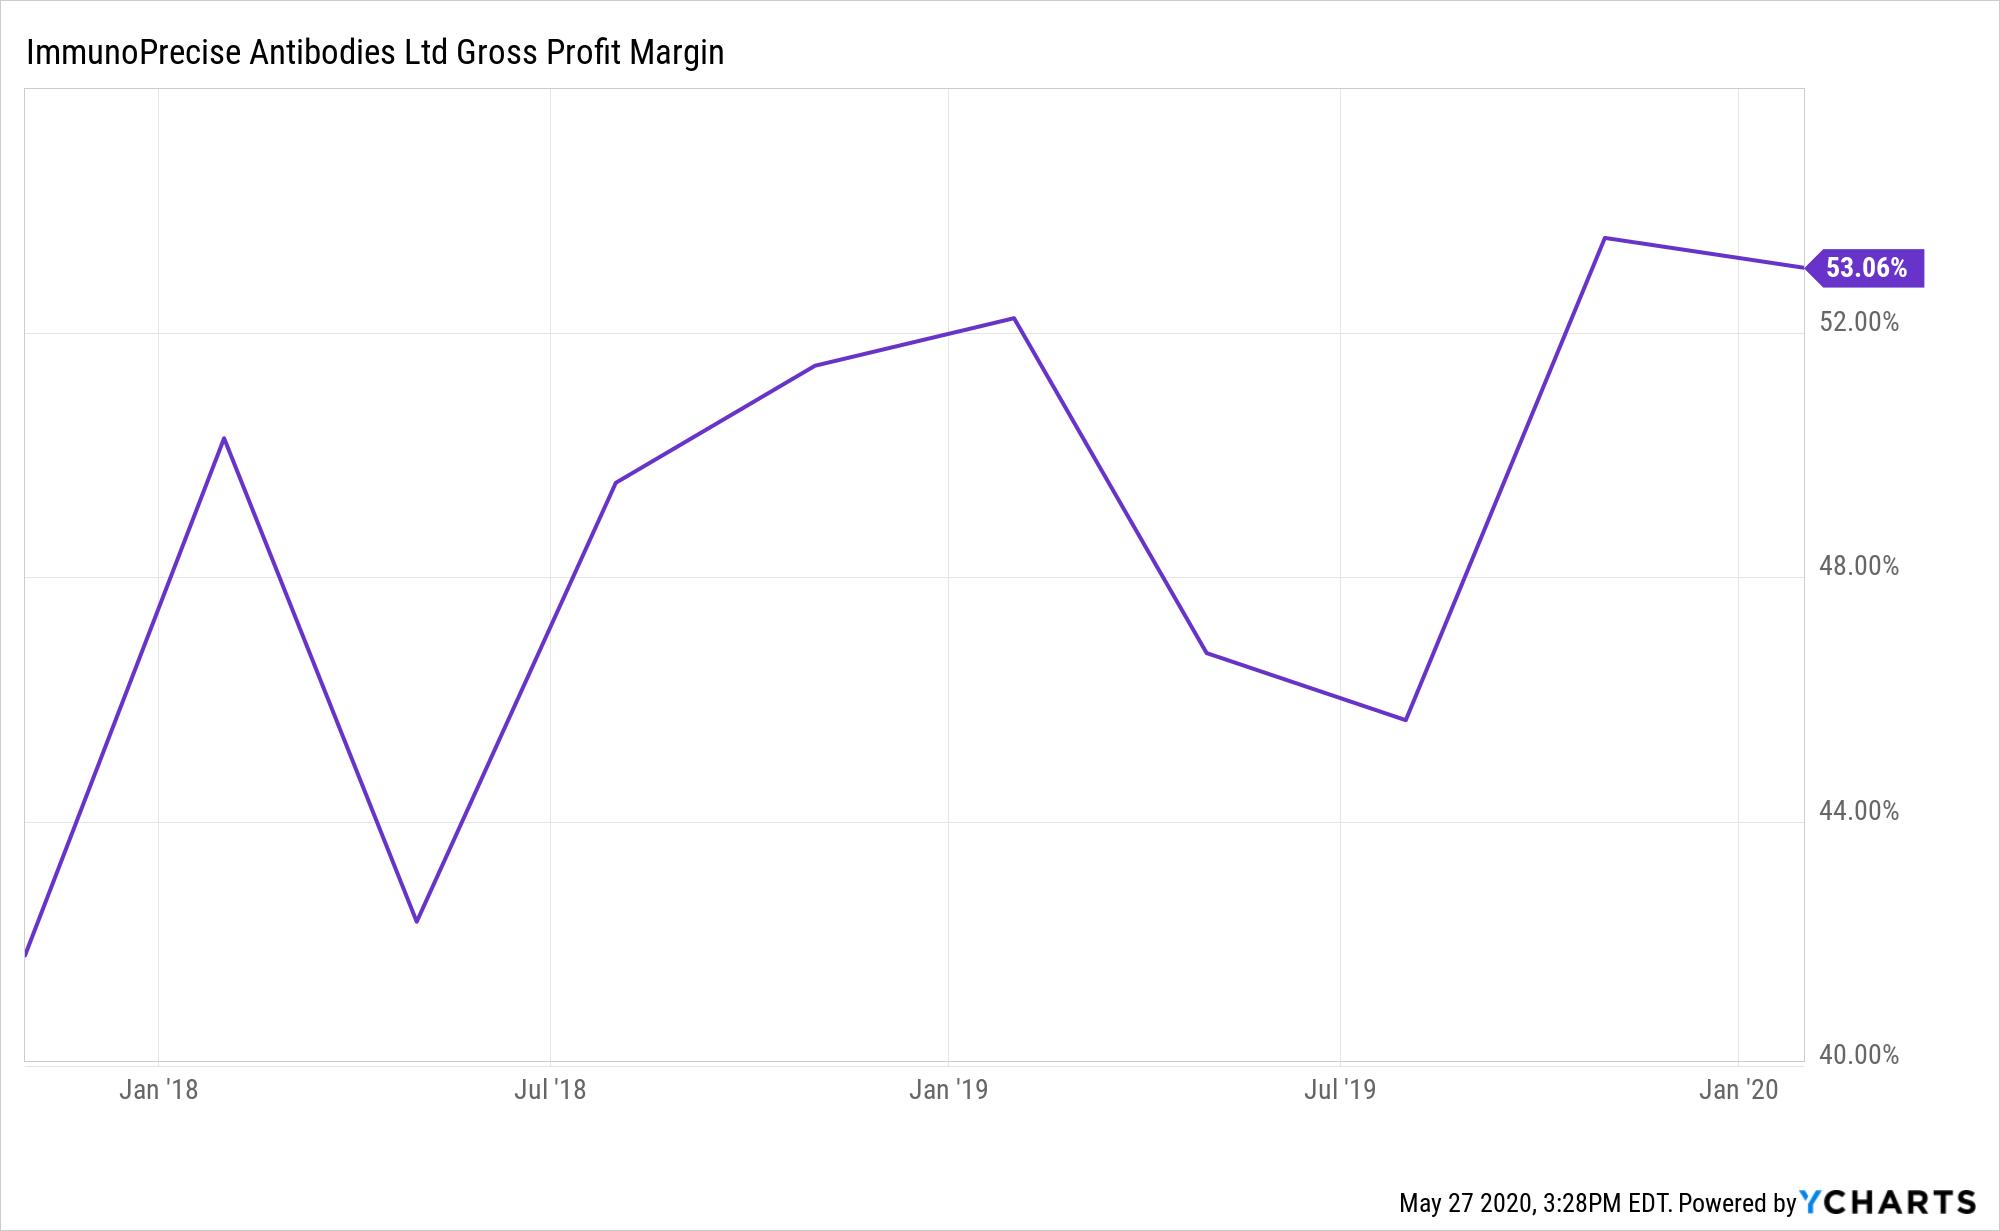 IPA Gross Profit Margin Chart